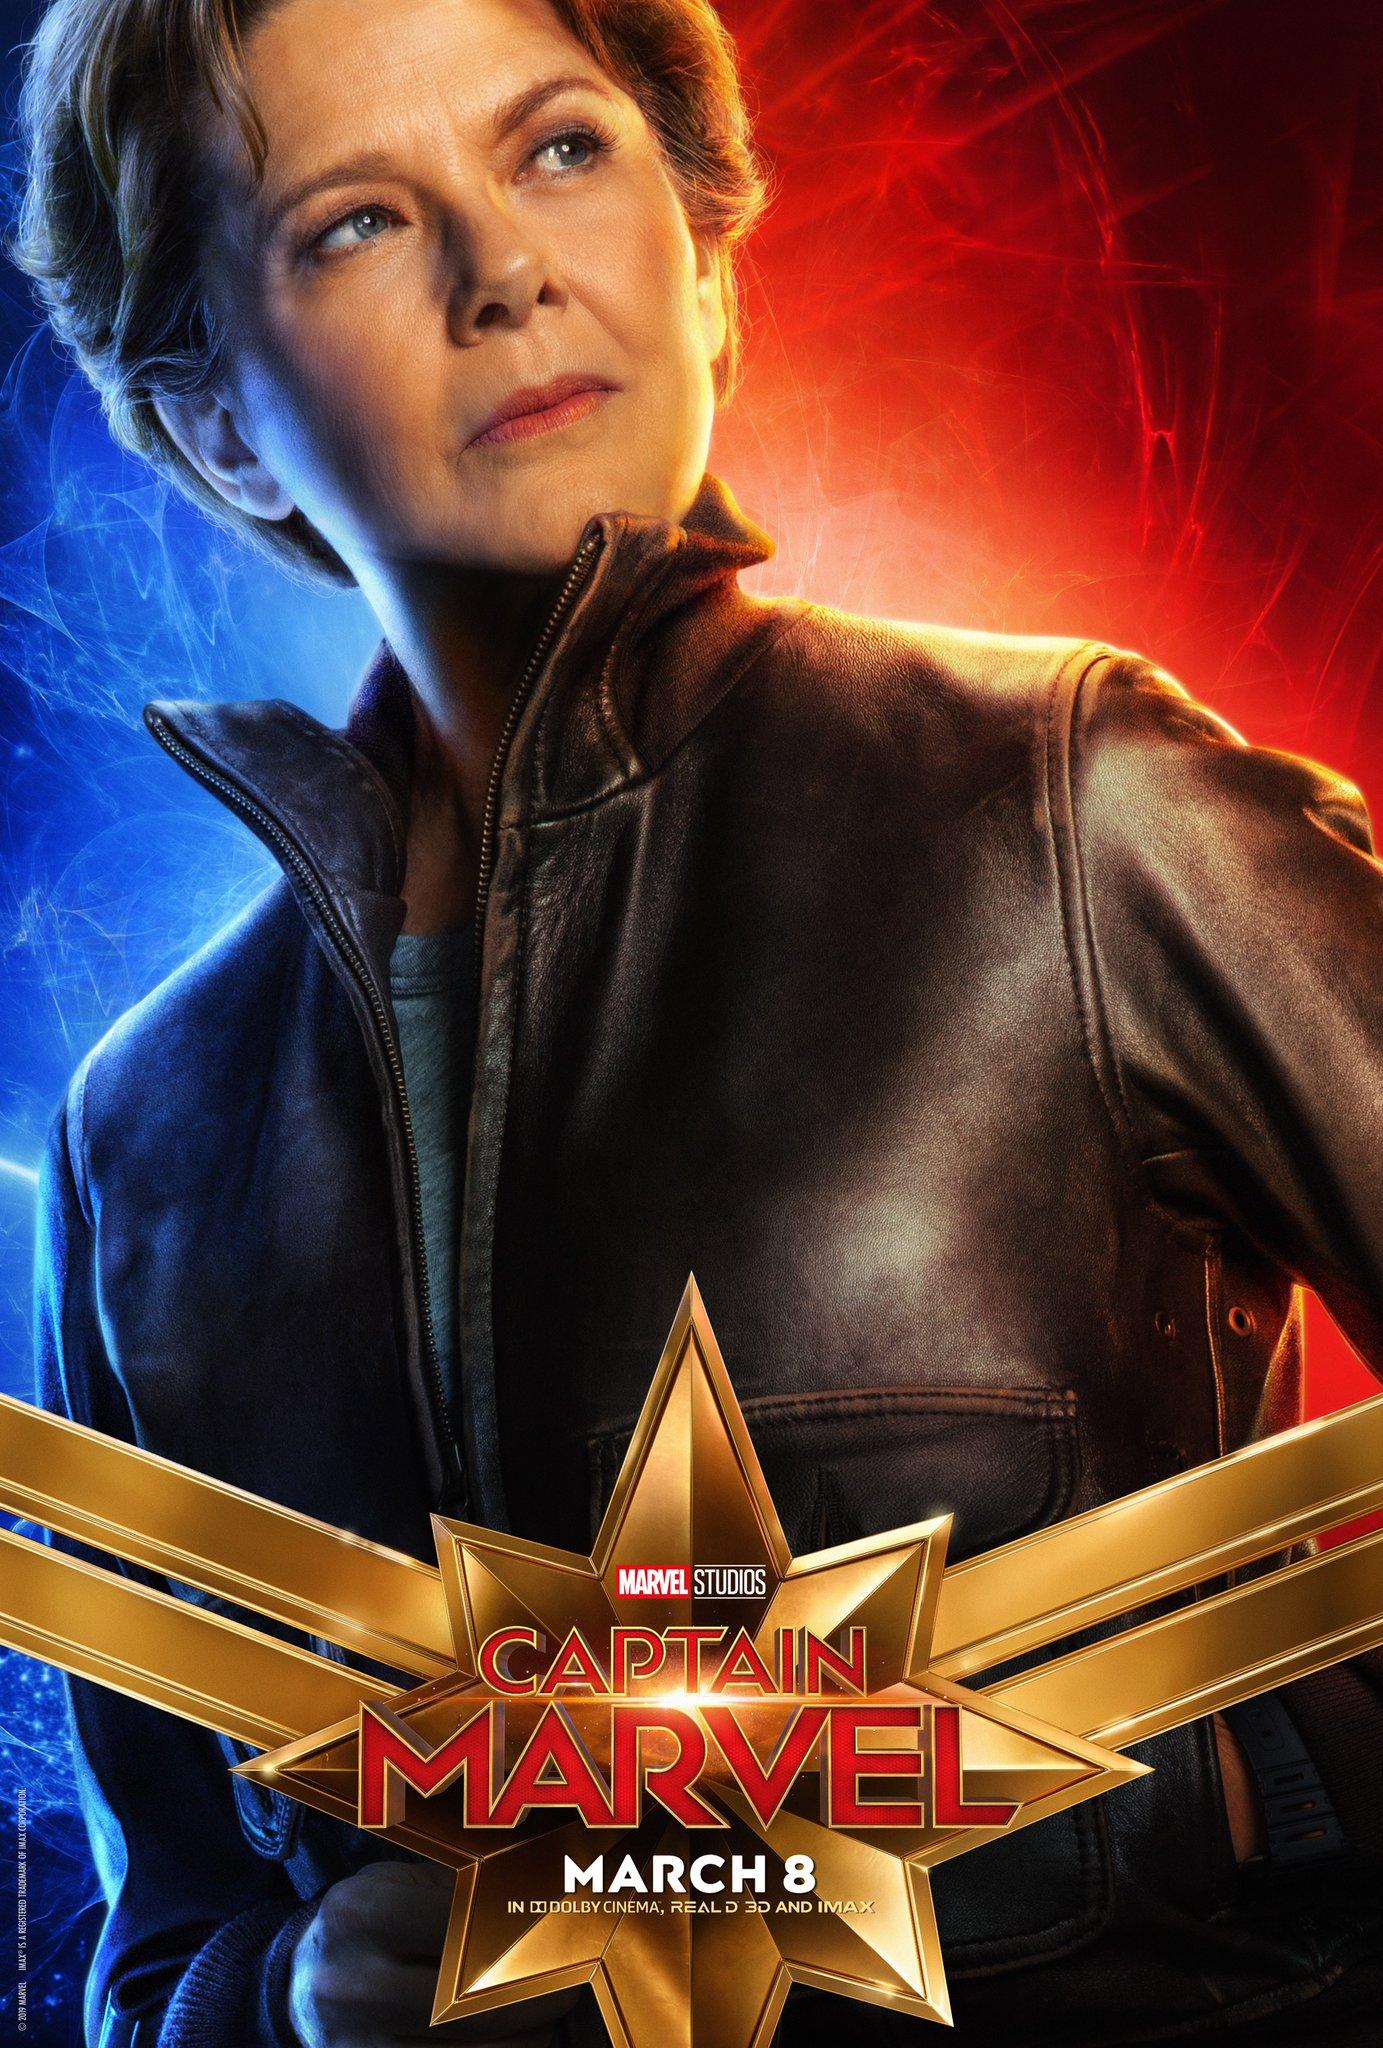 Captain Marvel Character Poster - Annette Benning Supreme Commander